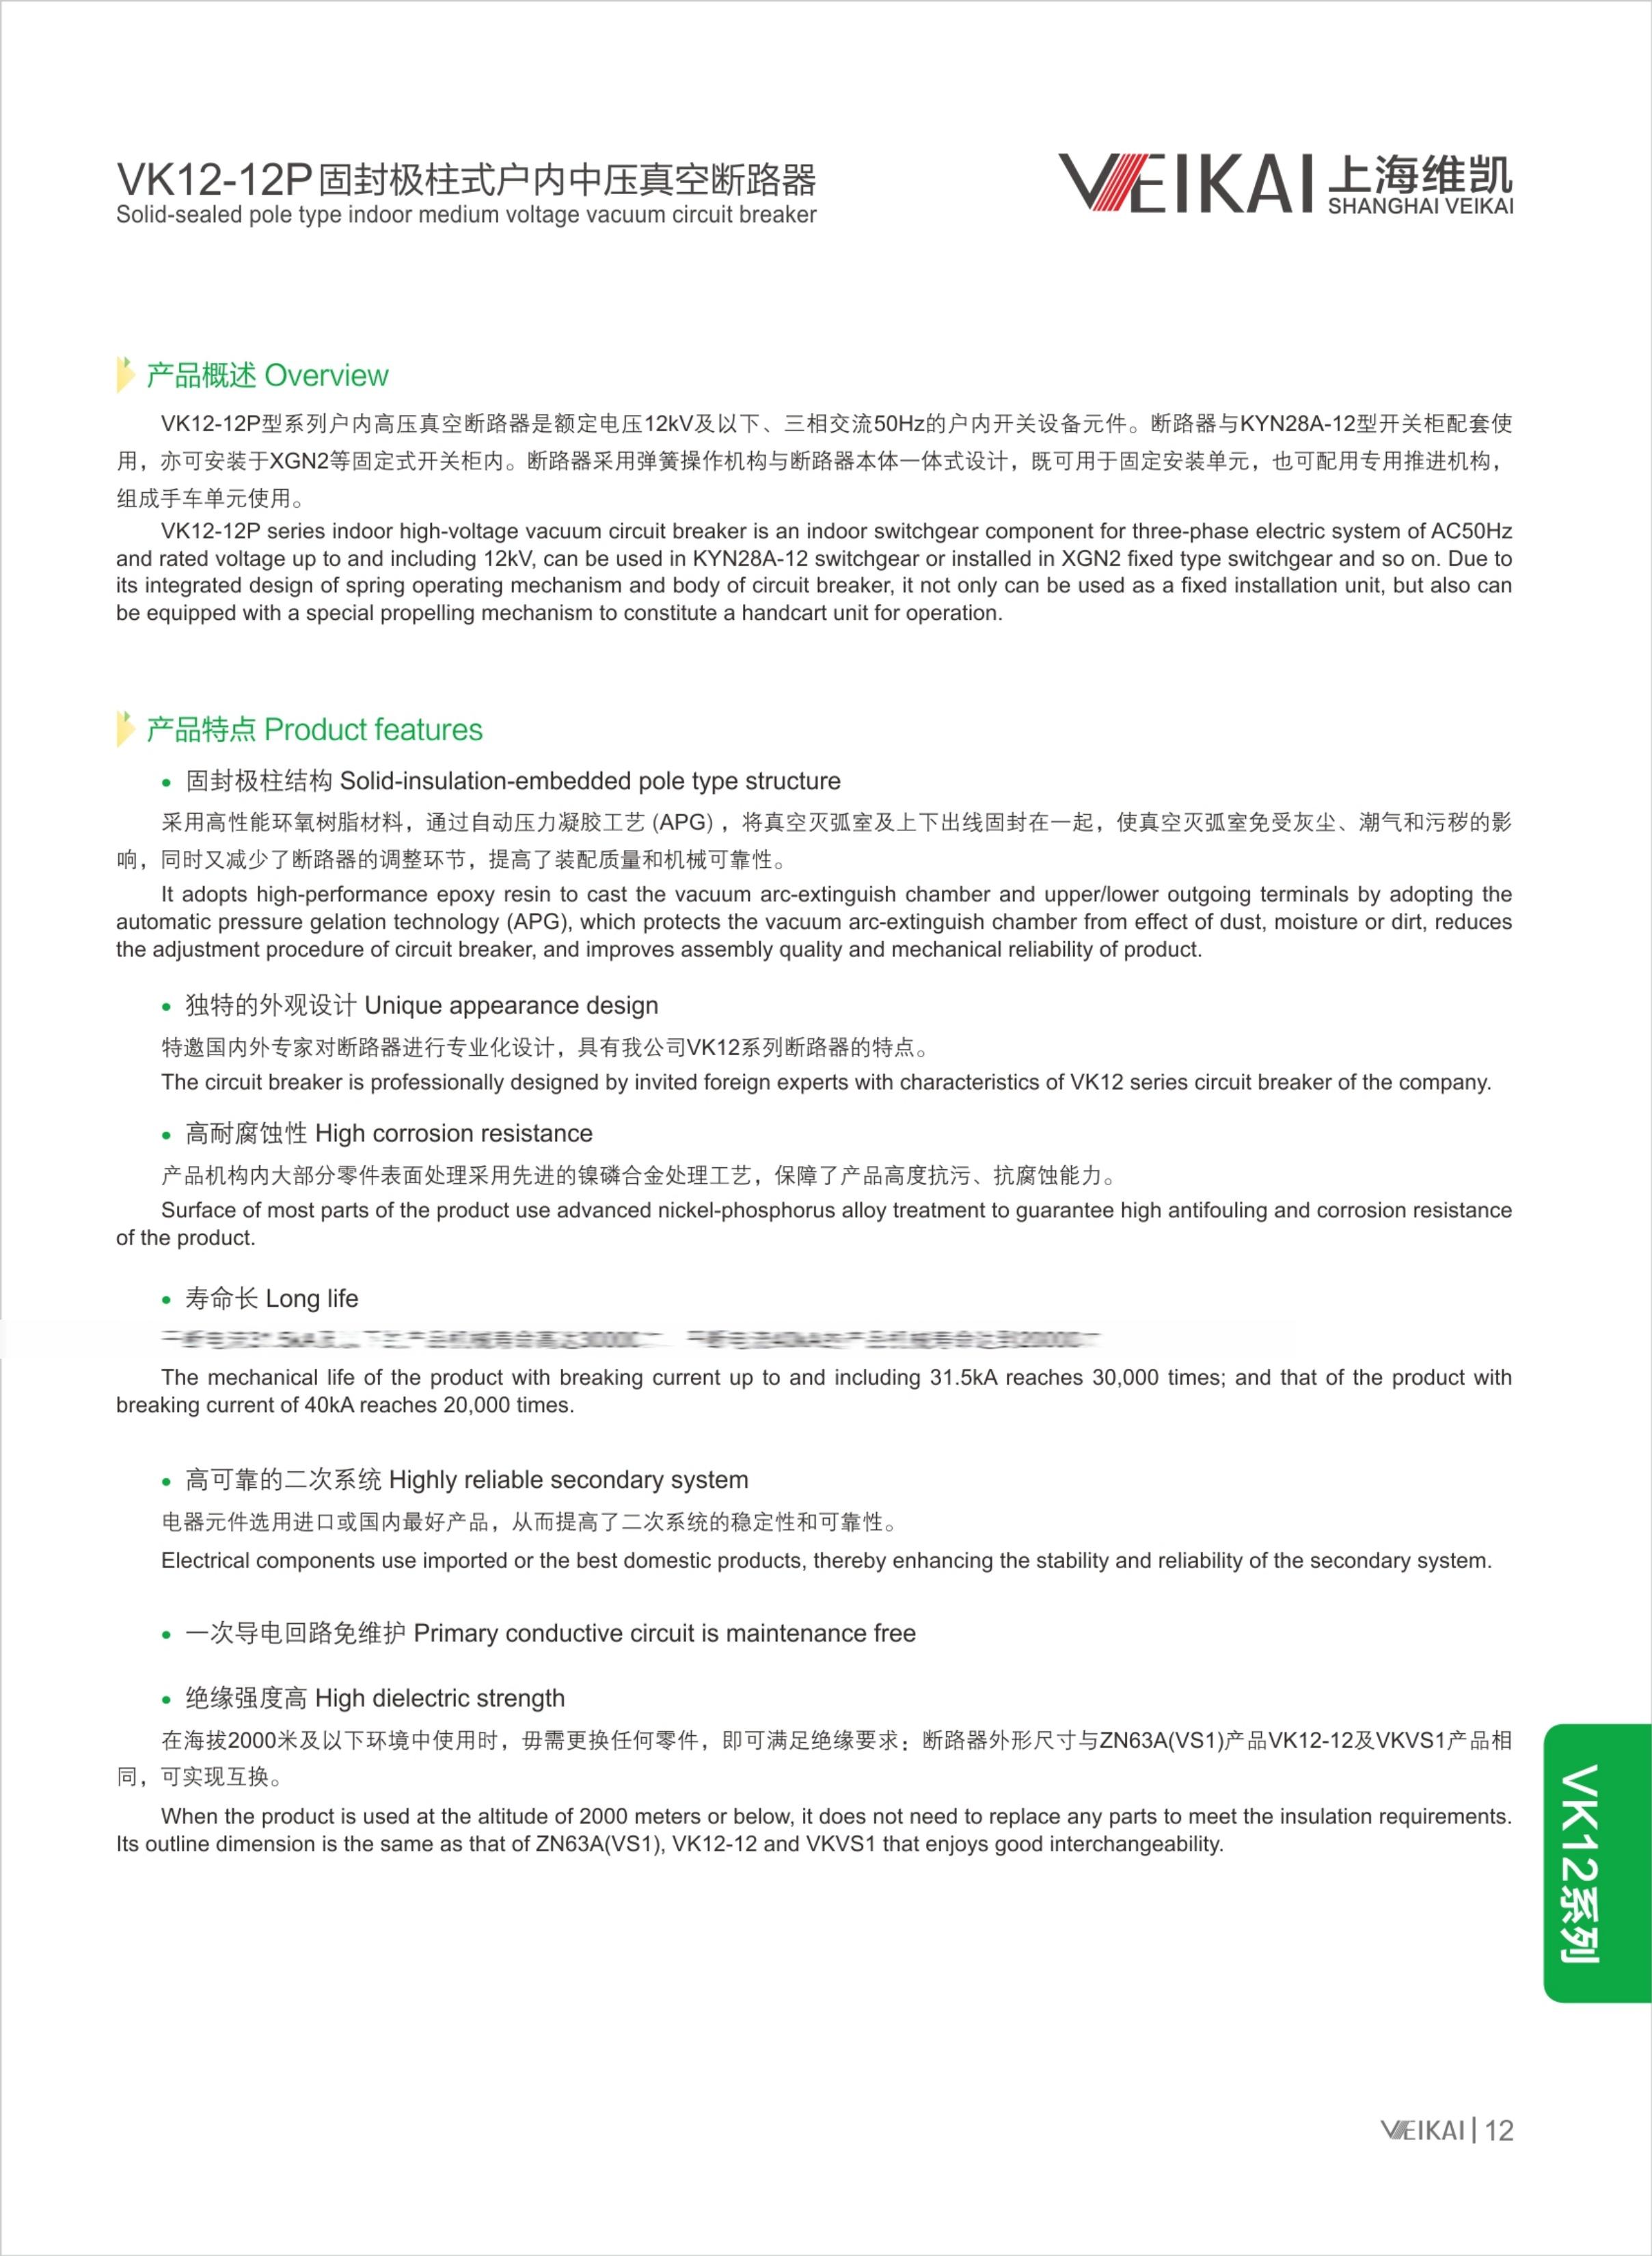 VK12系列产品选型手册_16.png